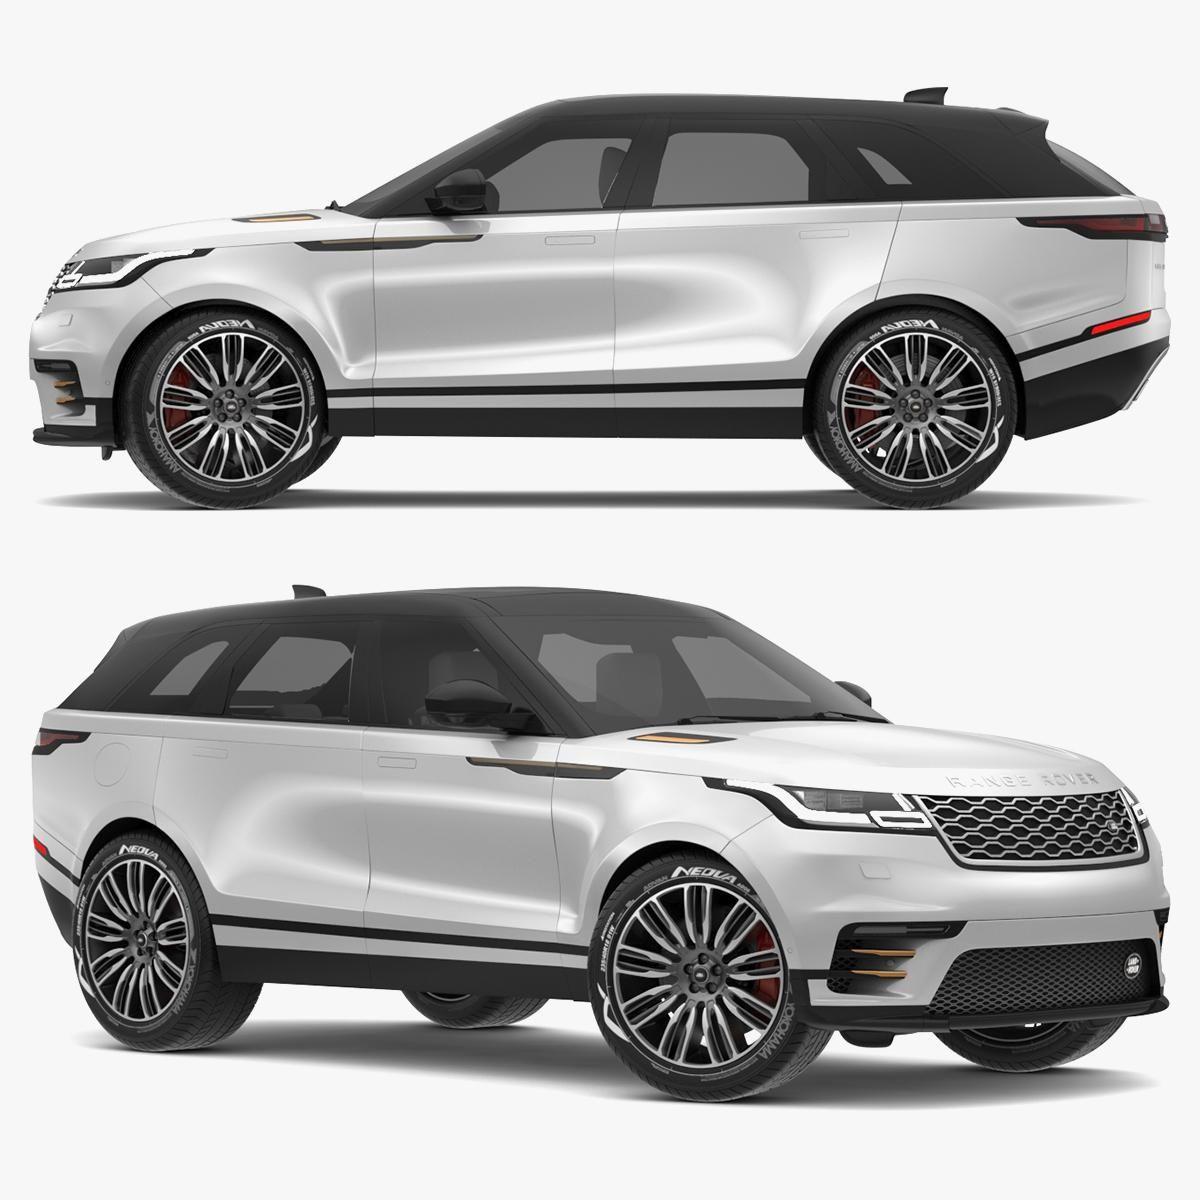 2018 Land Rover Range Rover Velar Indus Silver 3D Model